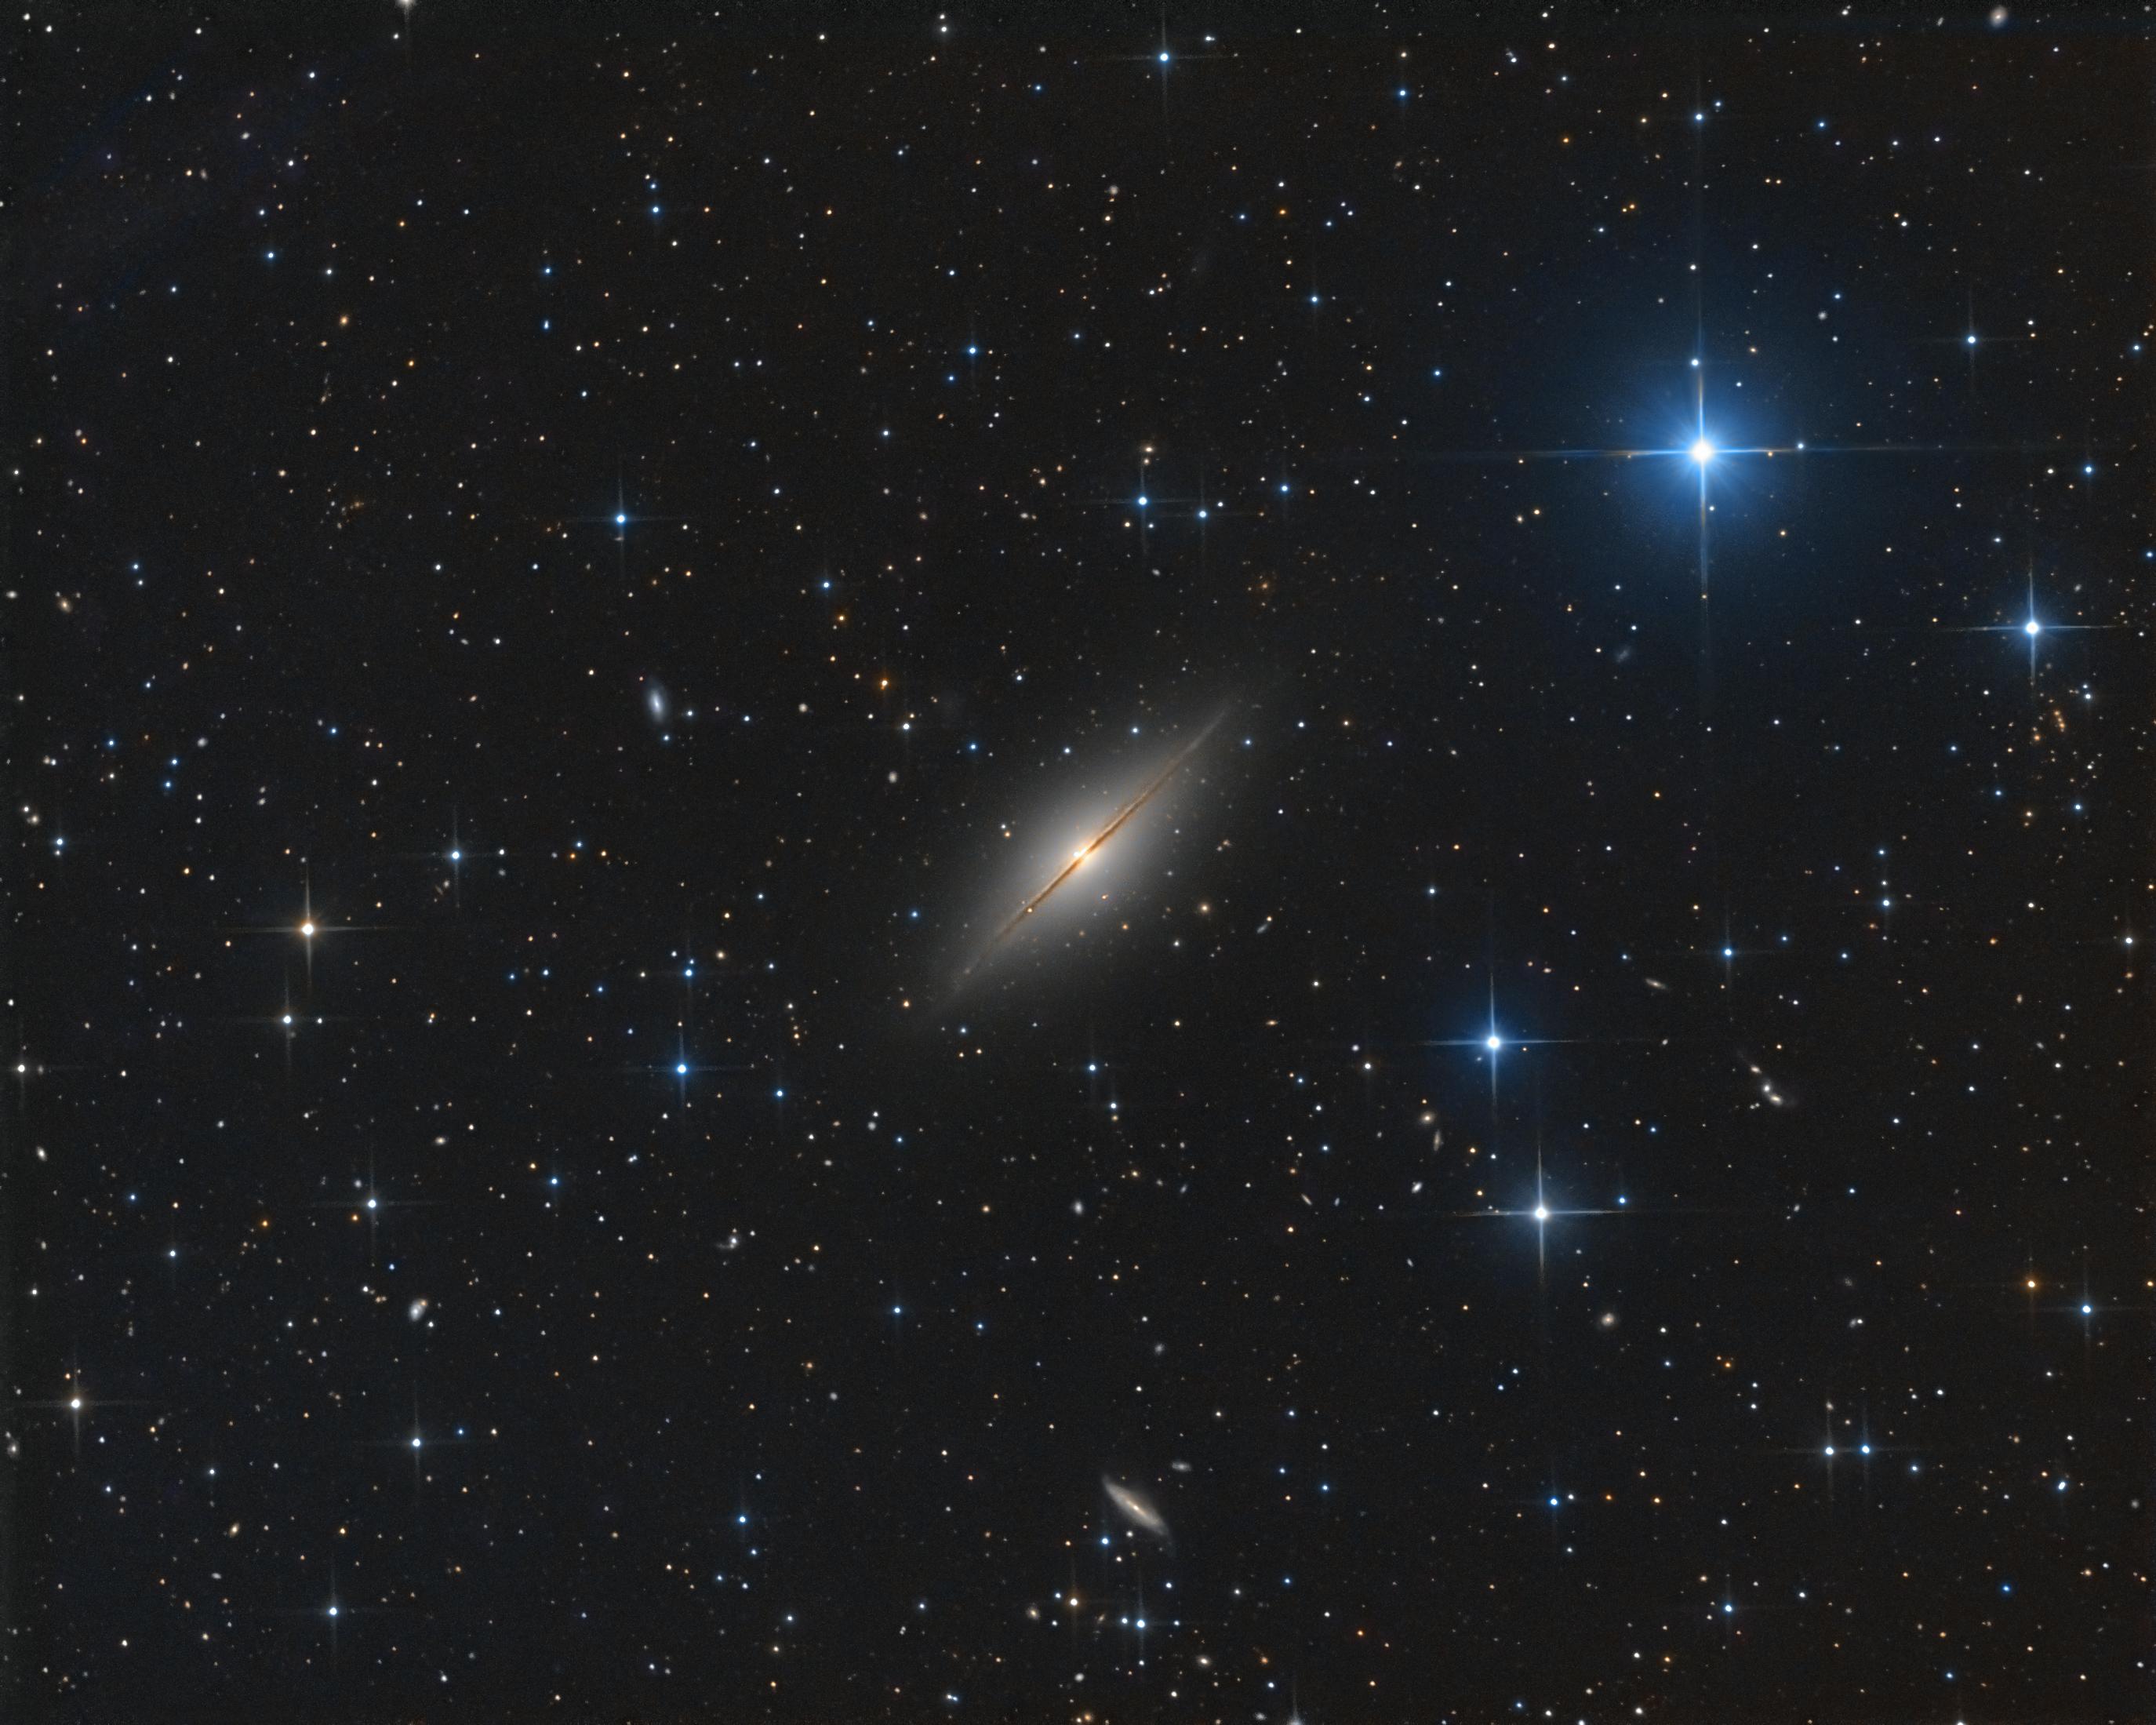 Supernova 2021rhu dans la galaxie NGC7814 Picture-bdec2cdc547b6fd41092517b91c37626-original